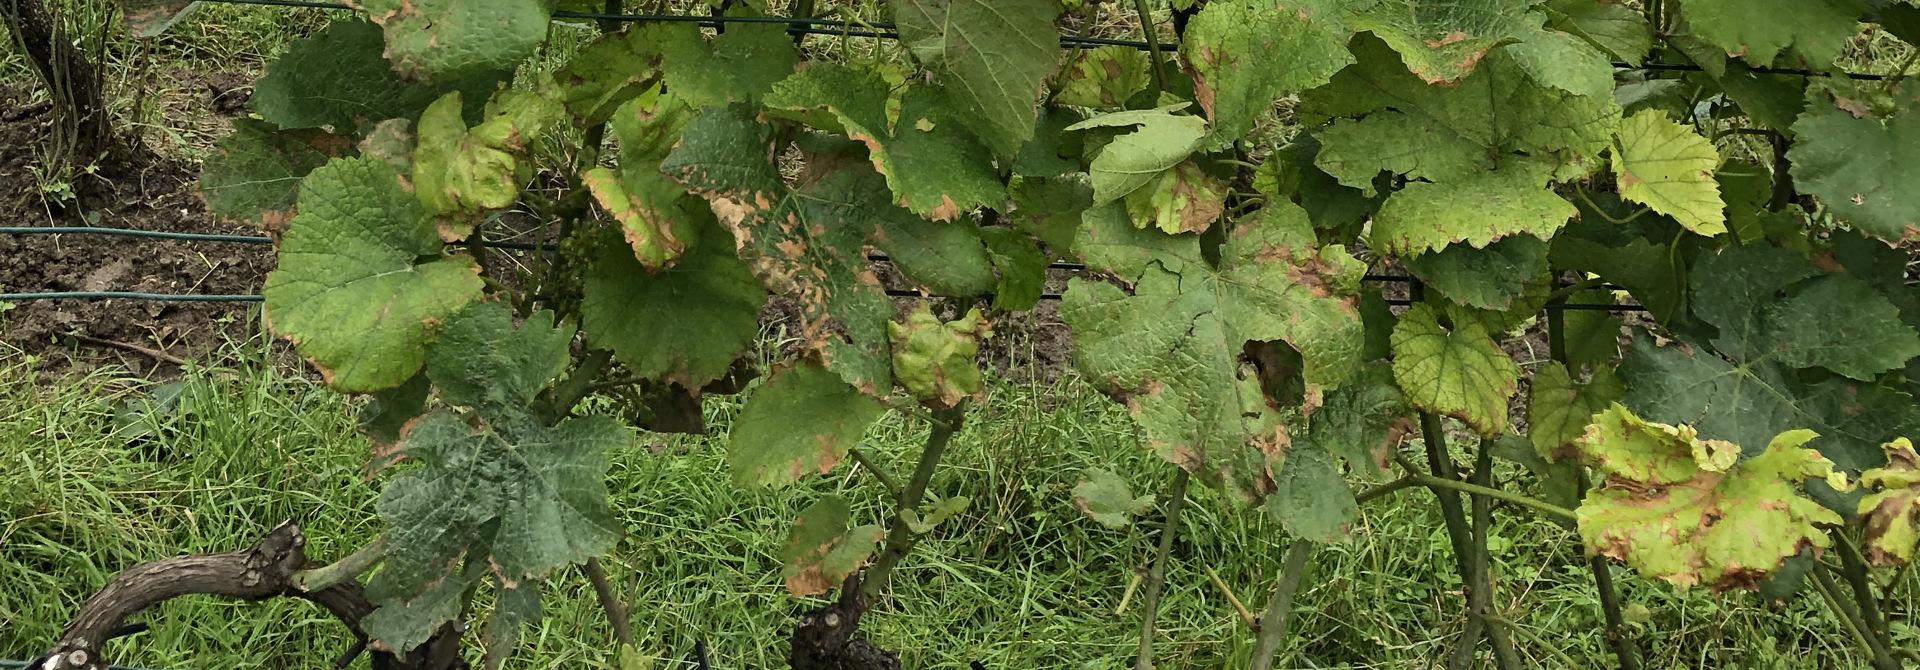 Starker Befall durch Falschen Mehltau (Plasmopara viticola) an Rebblu00e4ttern>